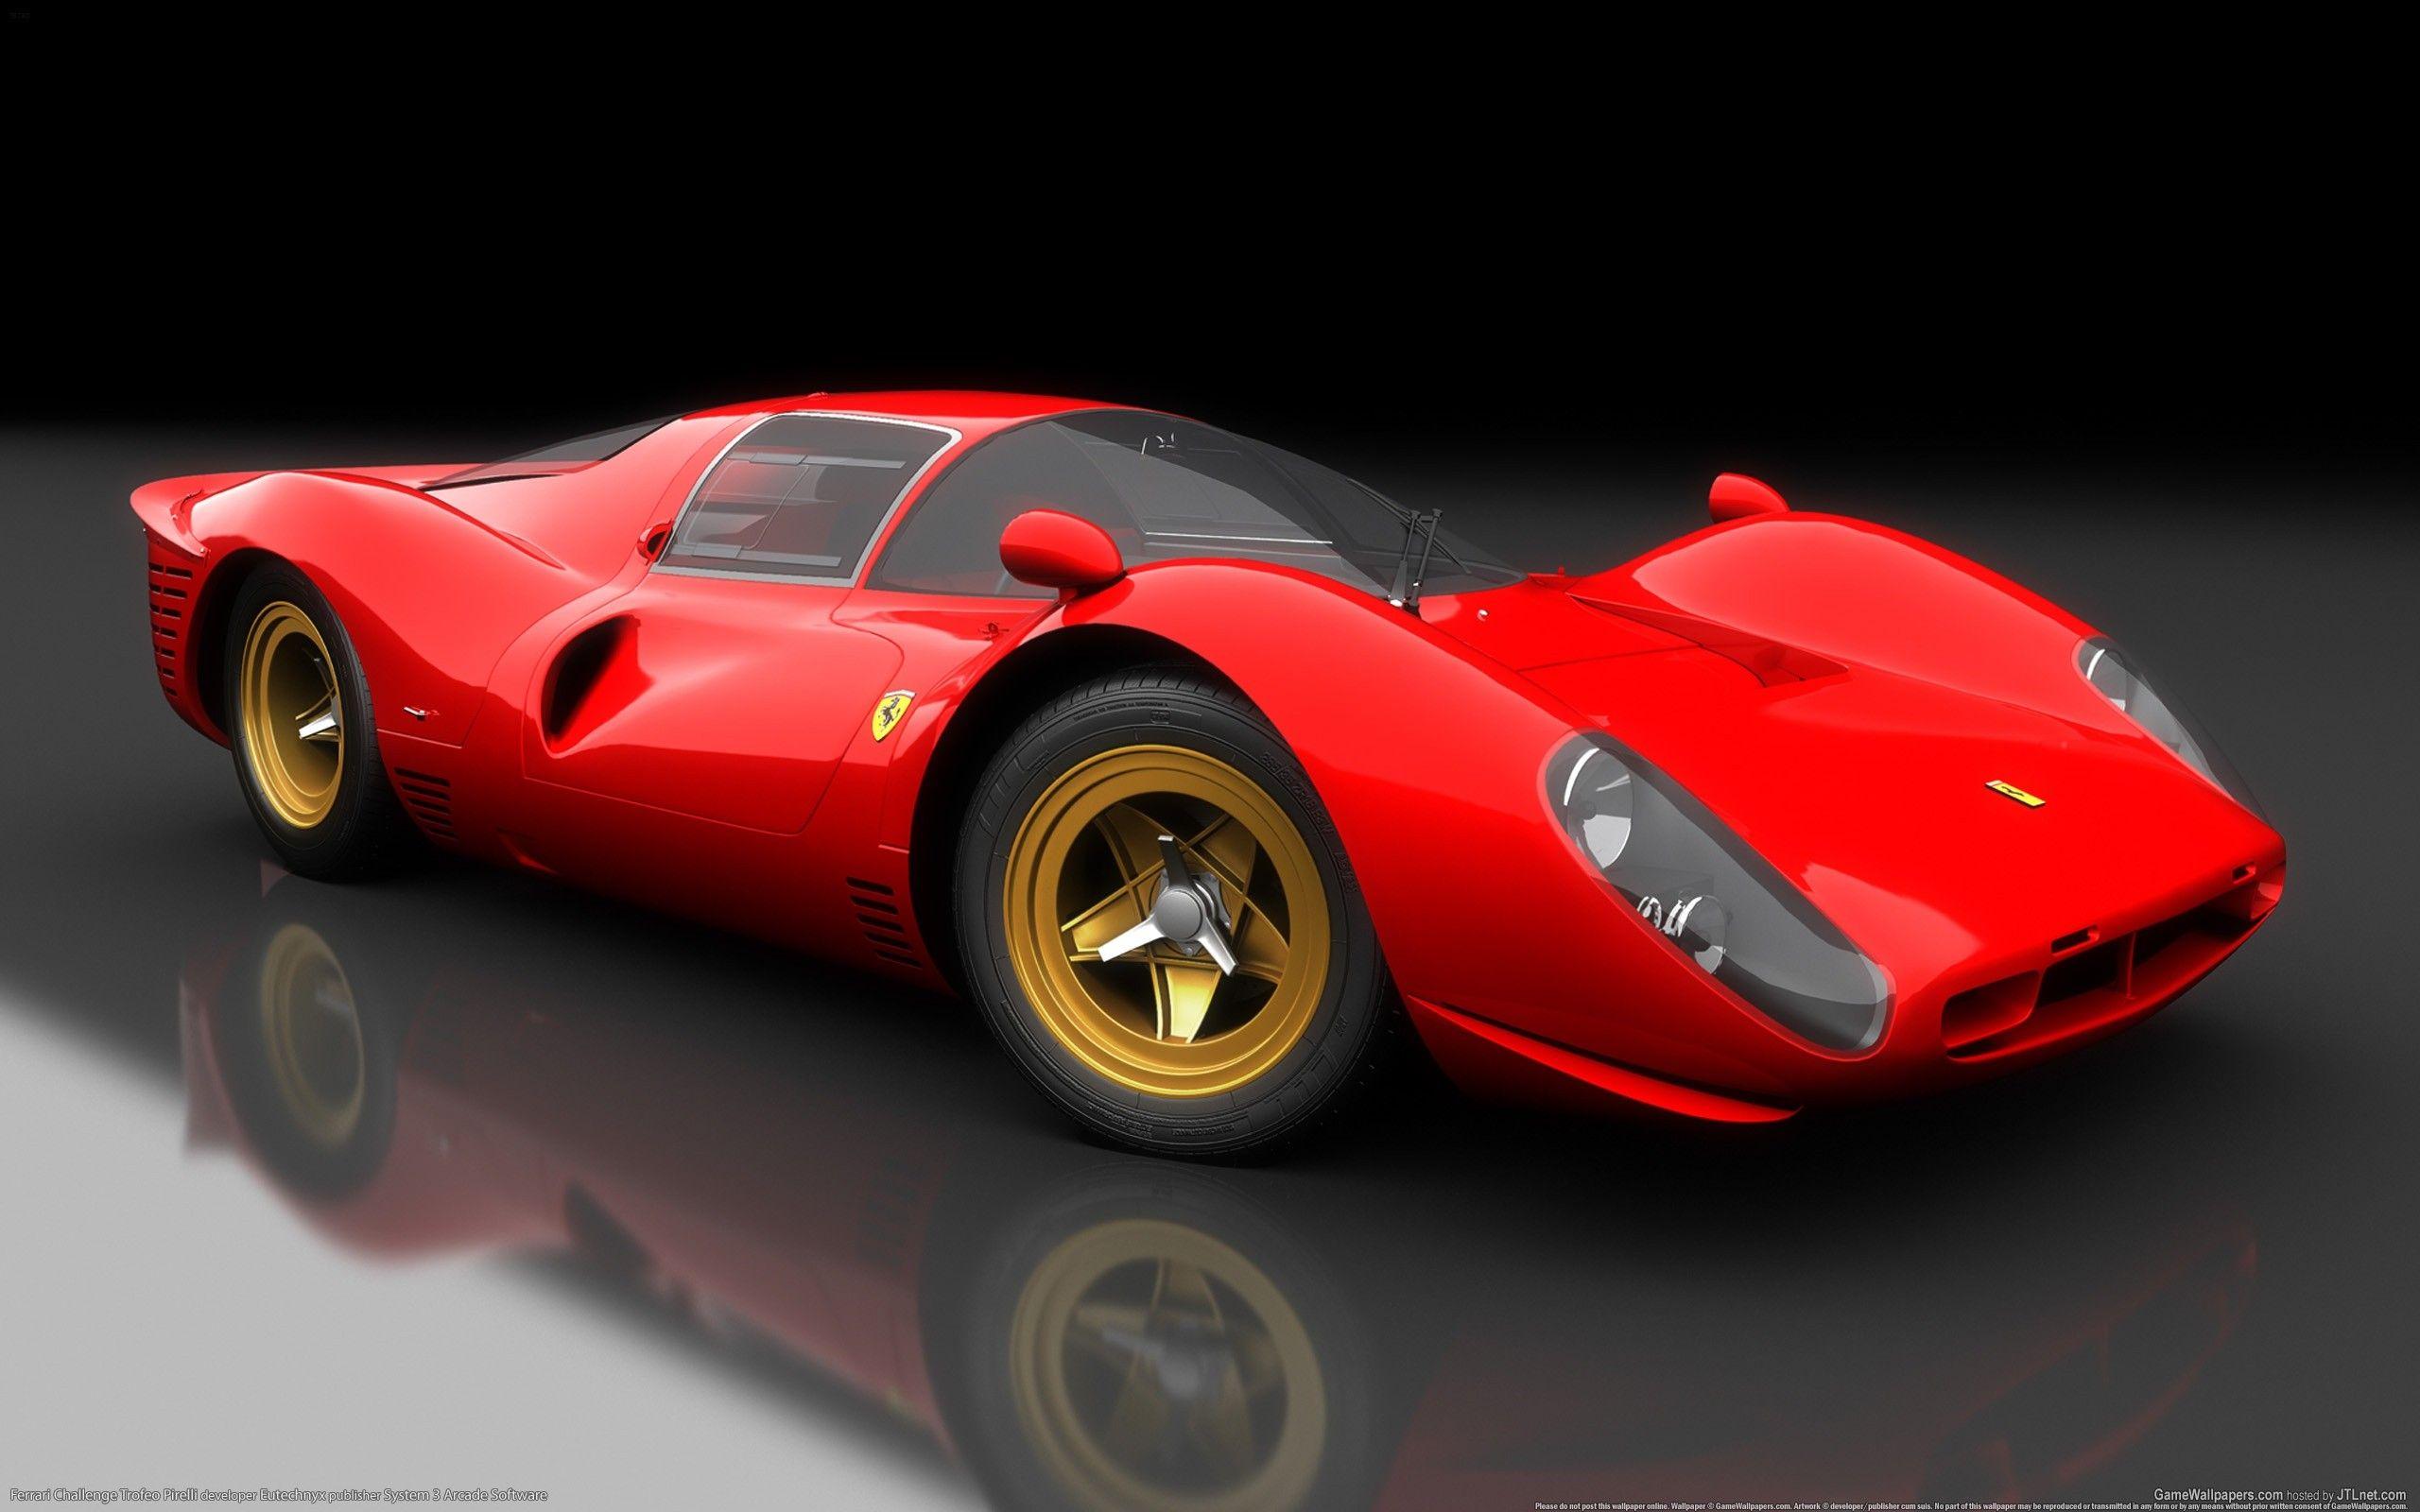 Merveilleux Http://www.autoblitz.pics/images/2014/05/3D Beautiful Red 3D Car  Wallpaper Latest HD Wallpaper   3D Grafiikka   Pinterest   Ferrari,  Cars And Car Repair